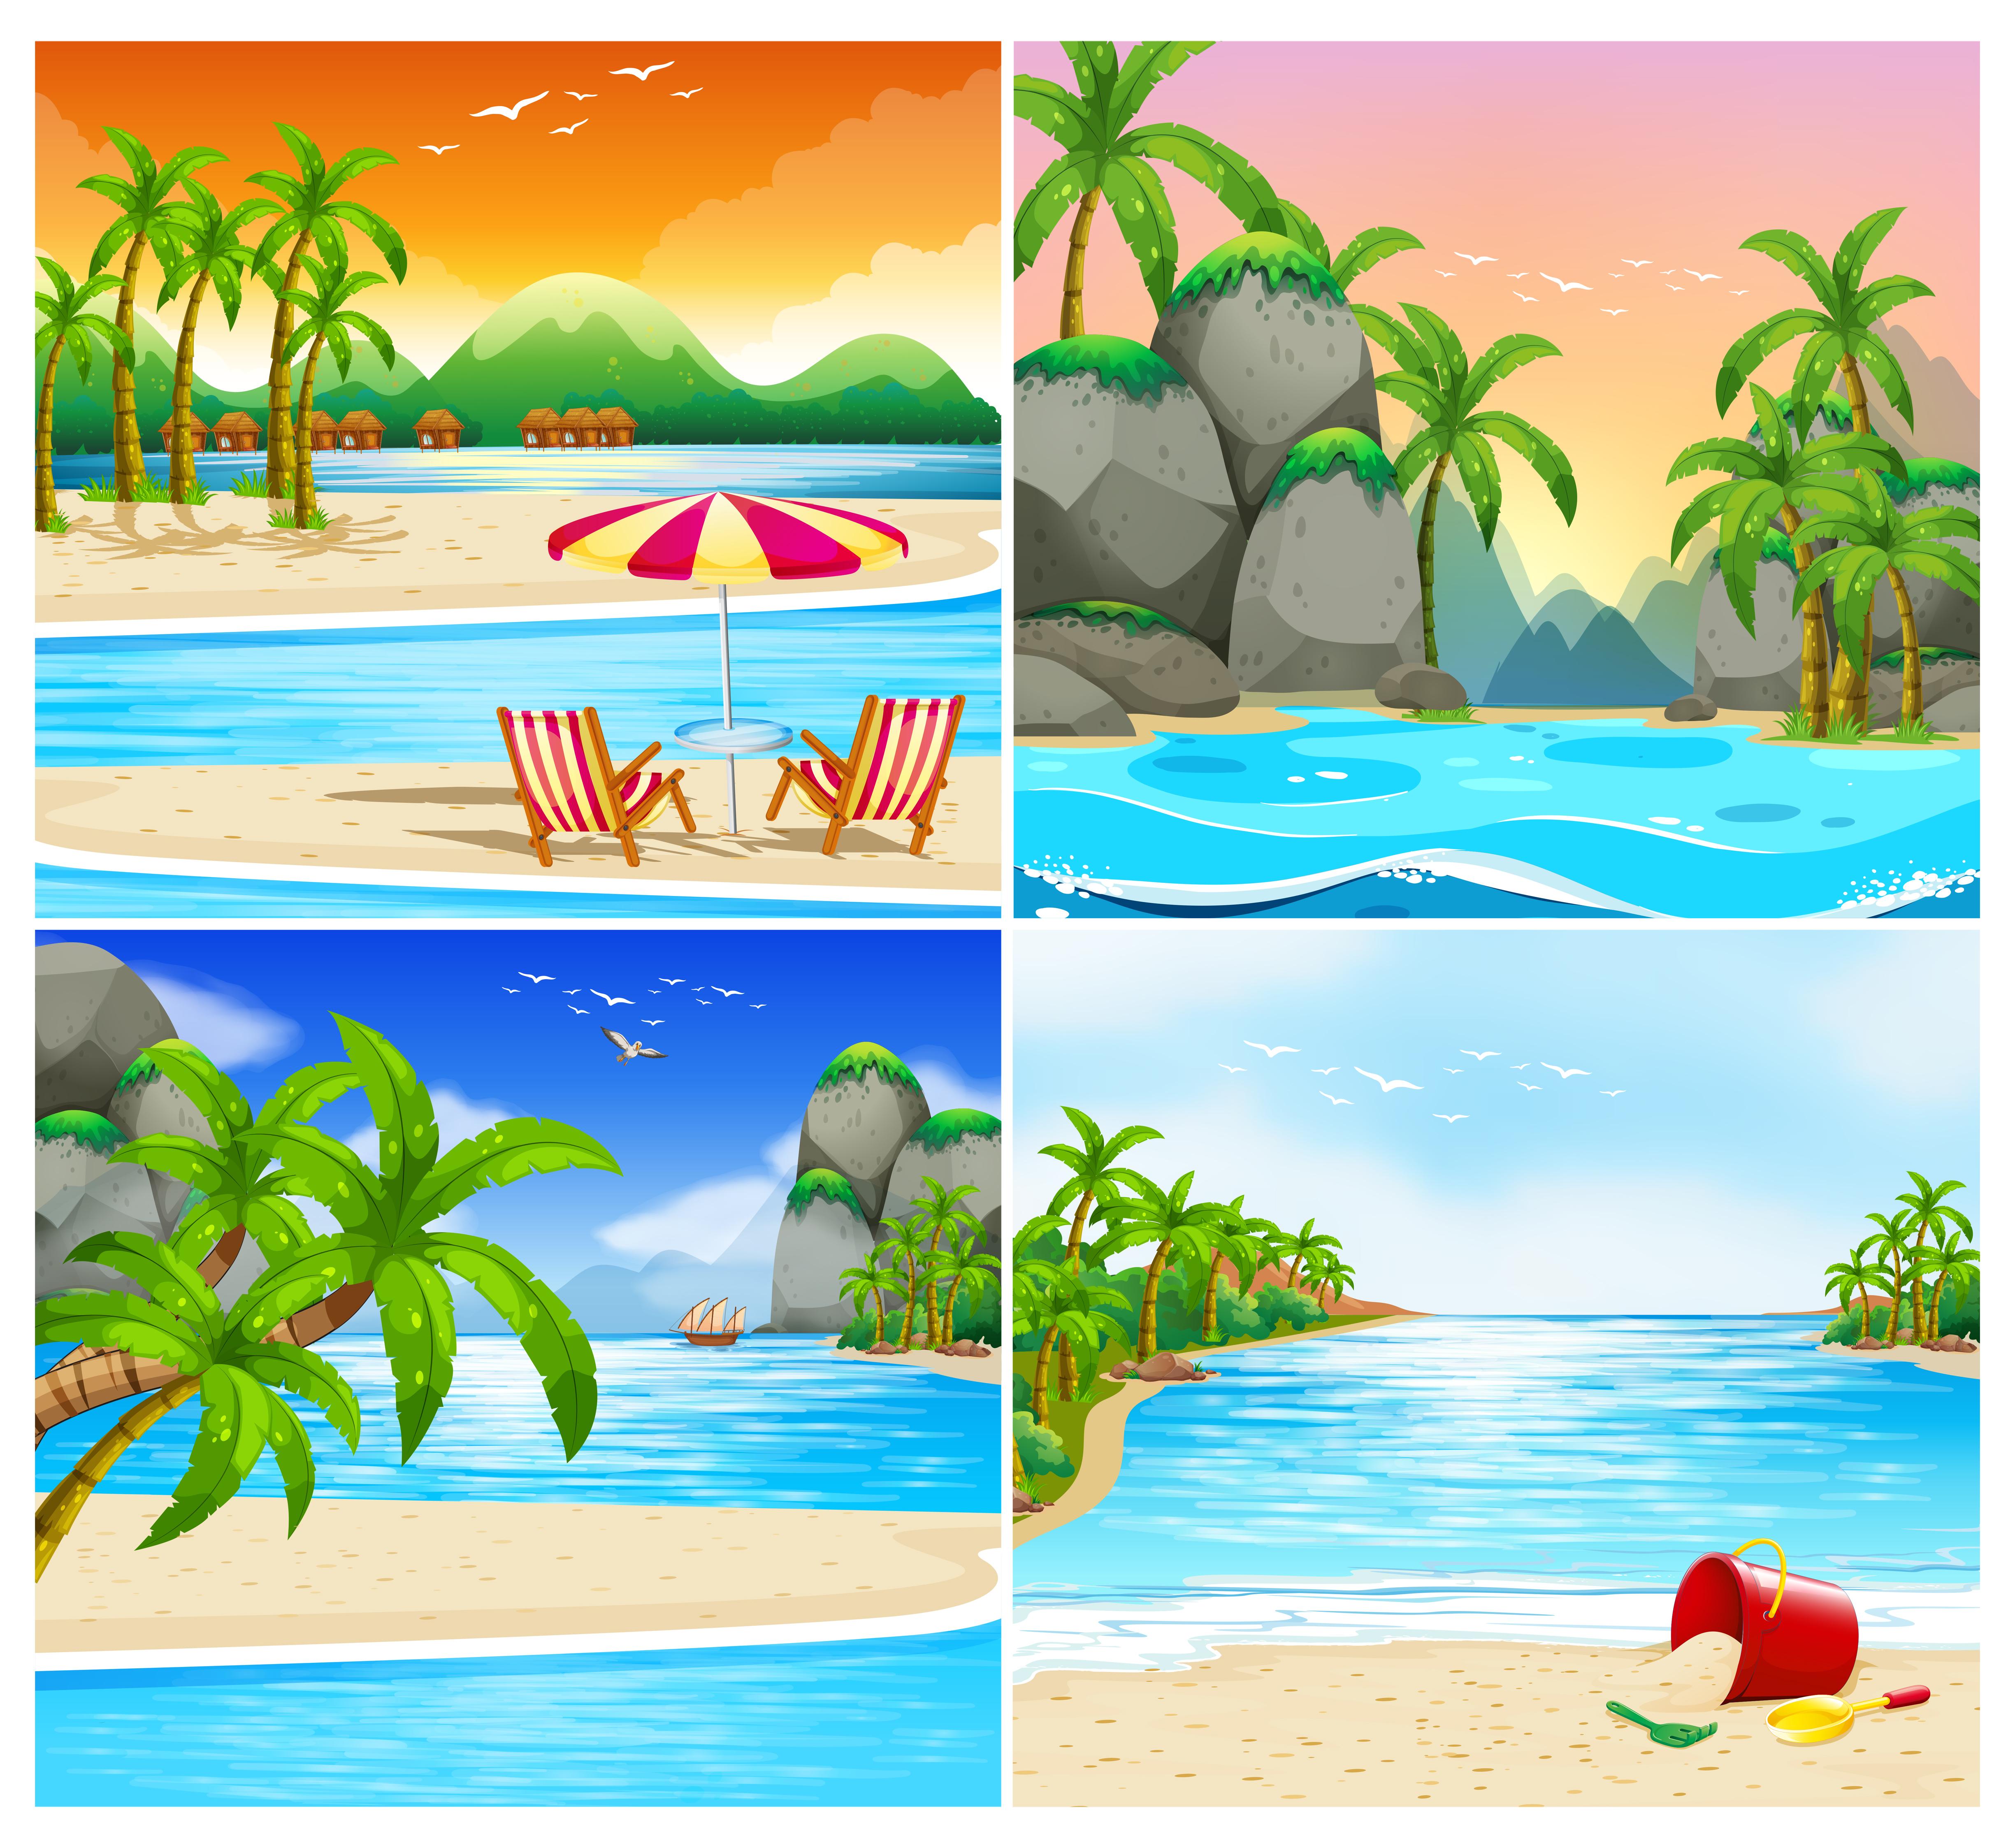 Island Beach Scenes: Four Scene Of Beach And Island